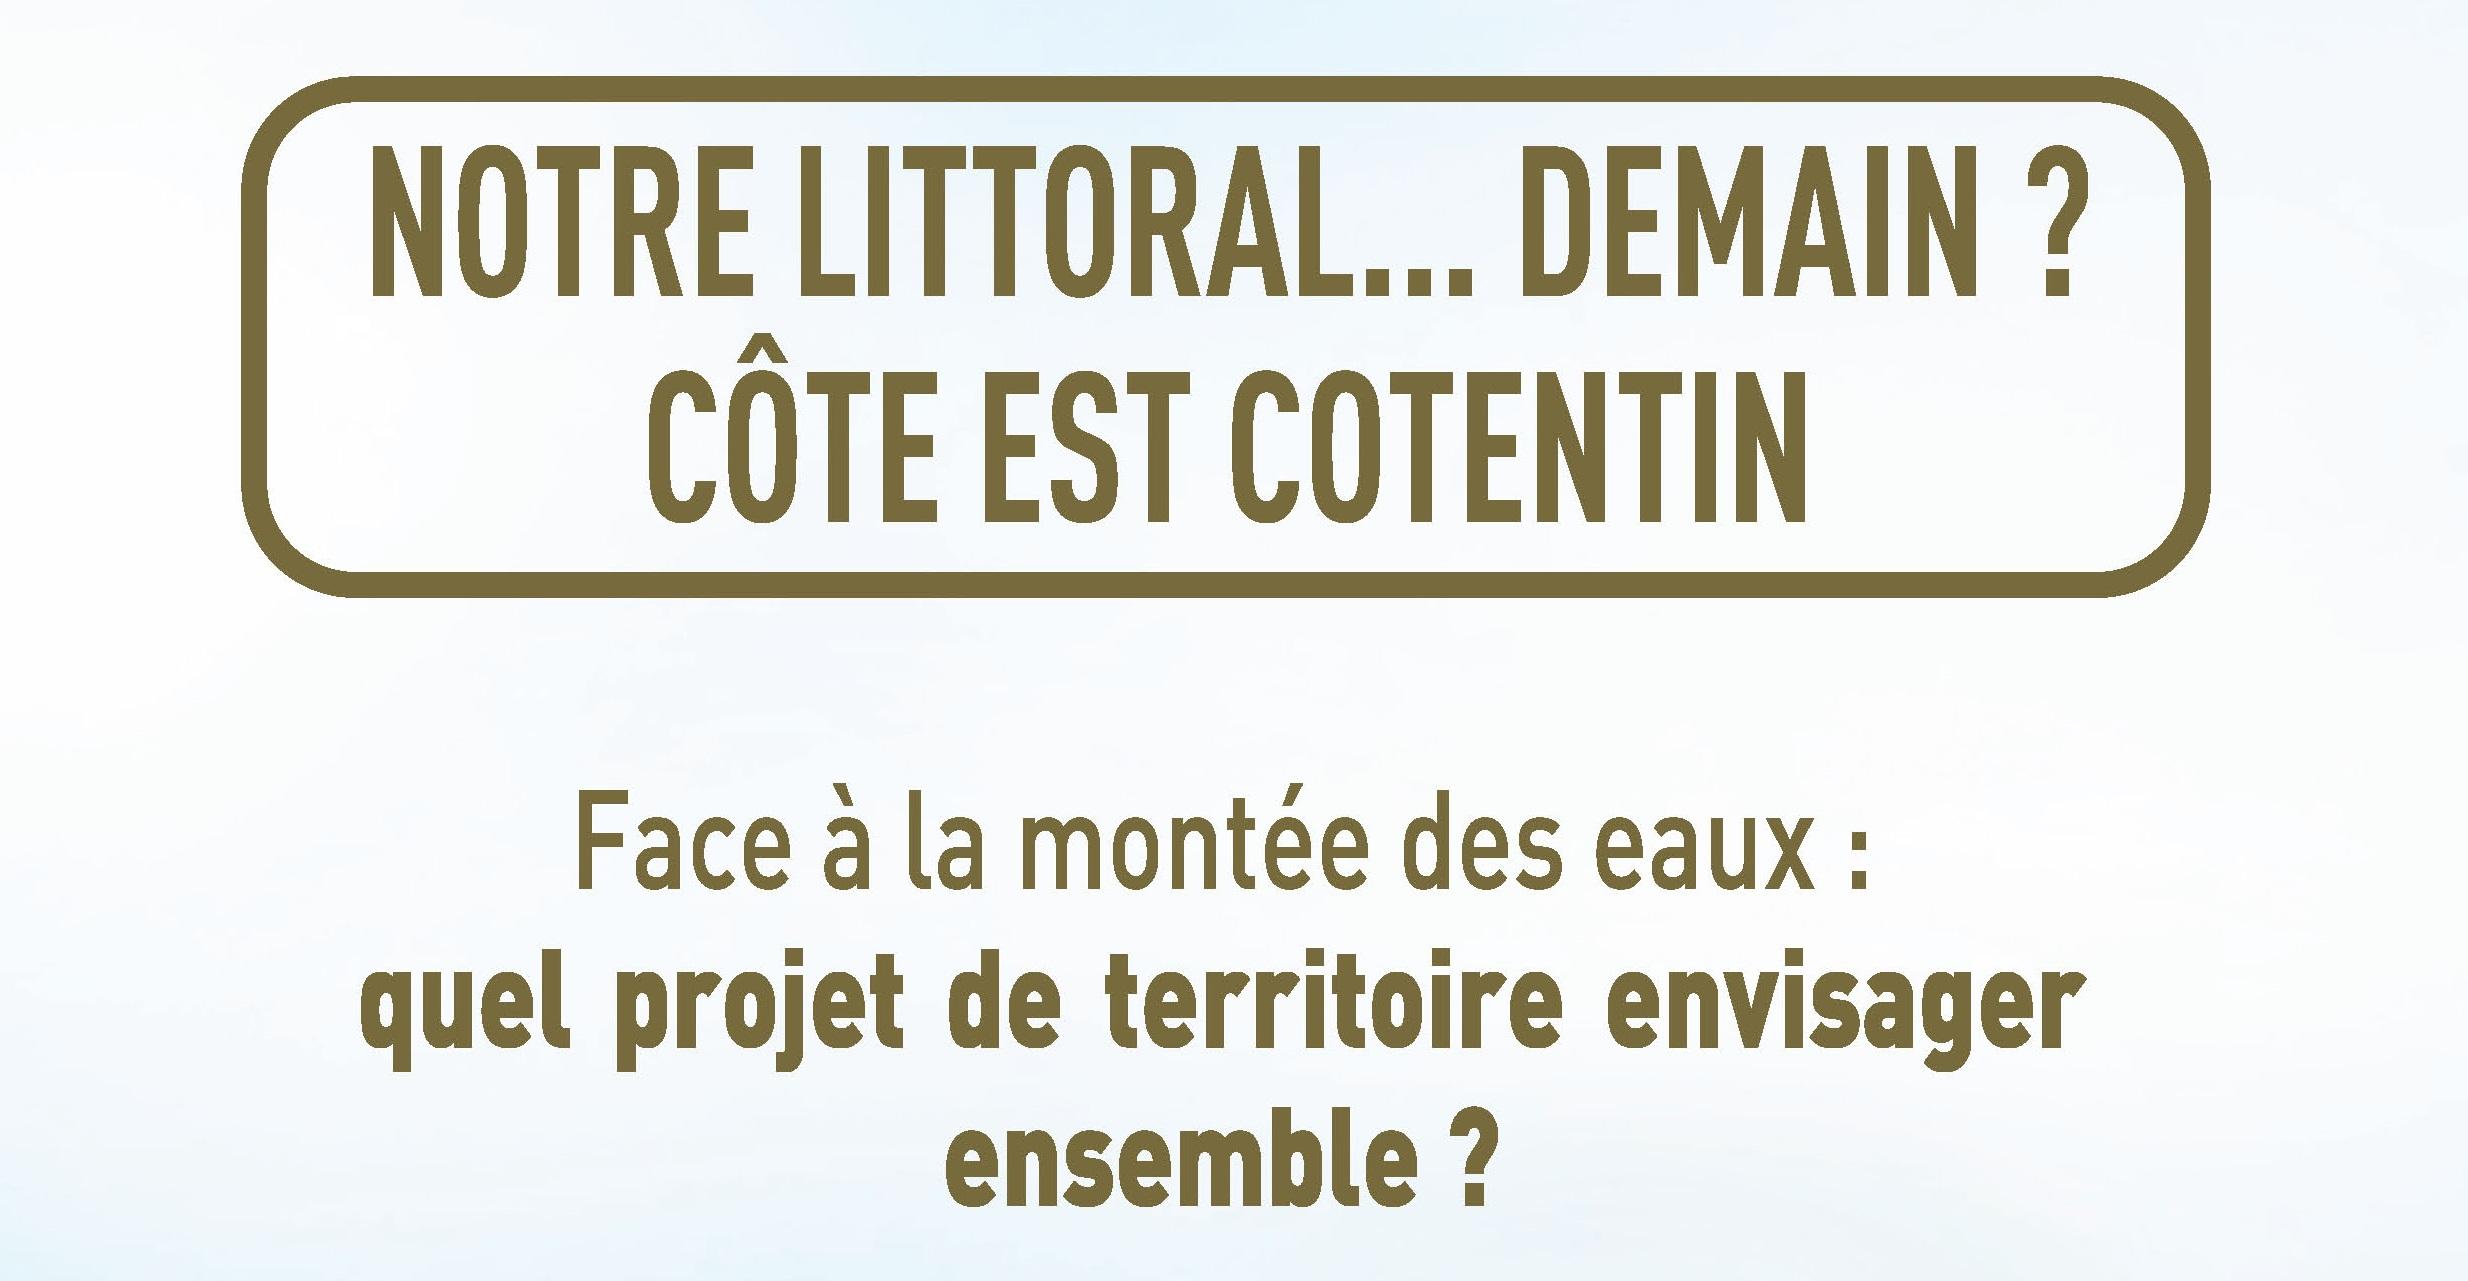 TITRE - CoteEstCotentinNotreLittoralPourDemain_A4